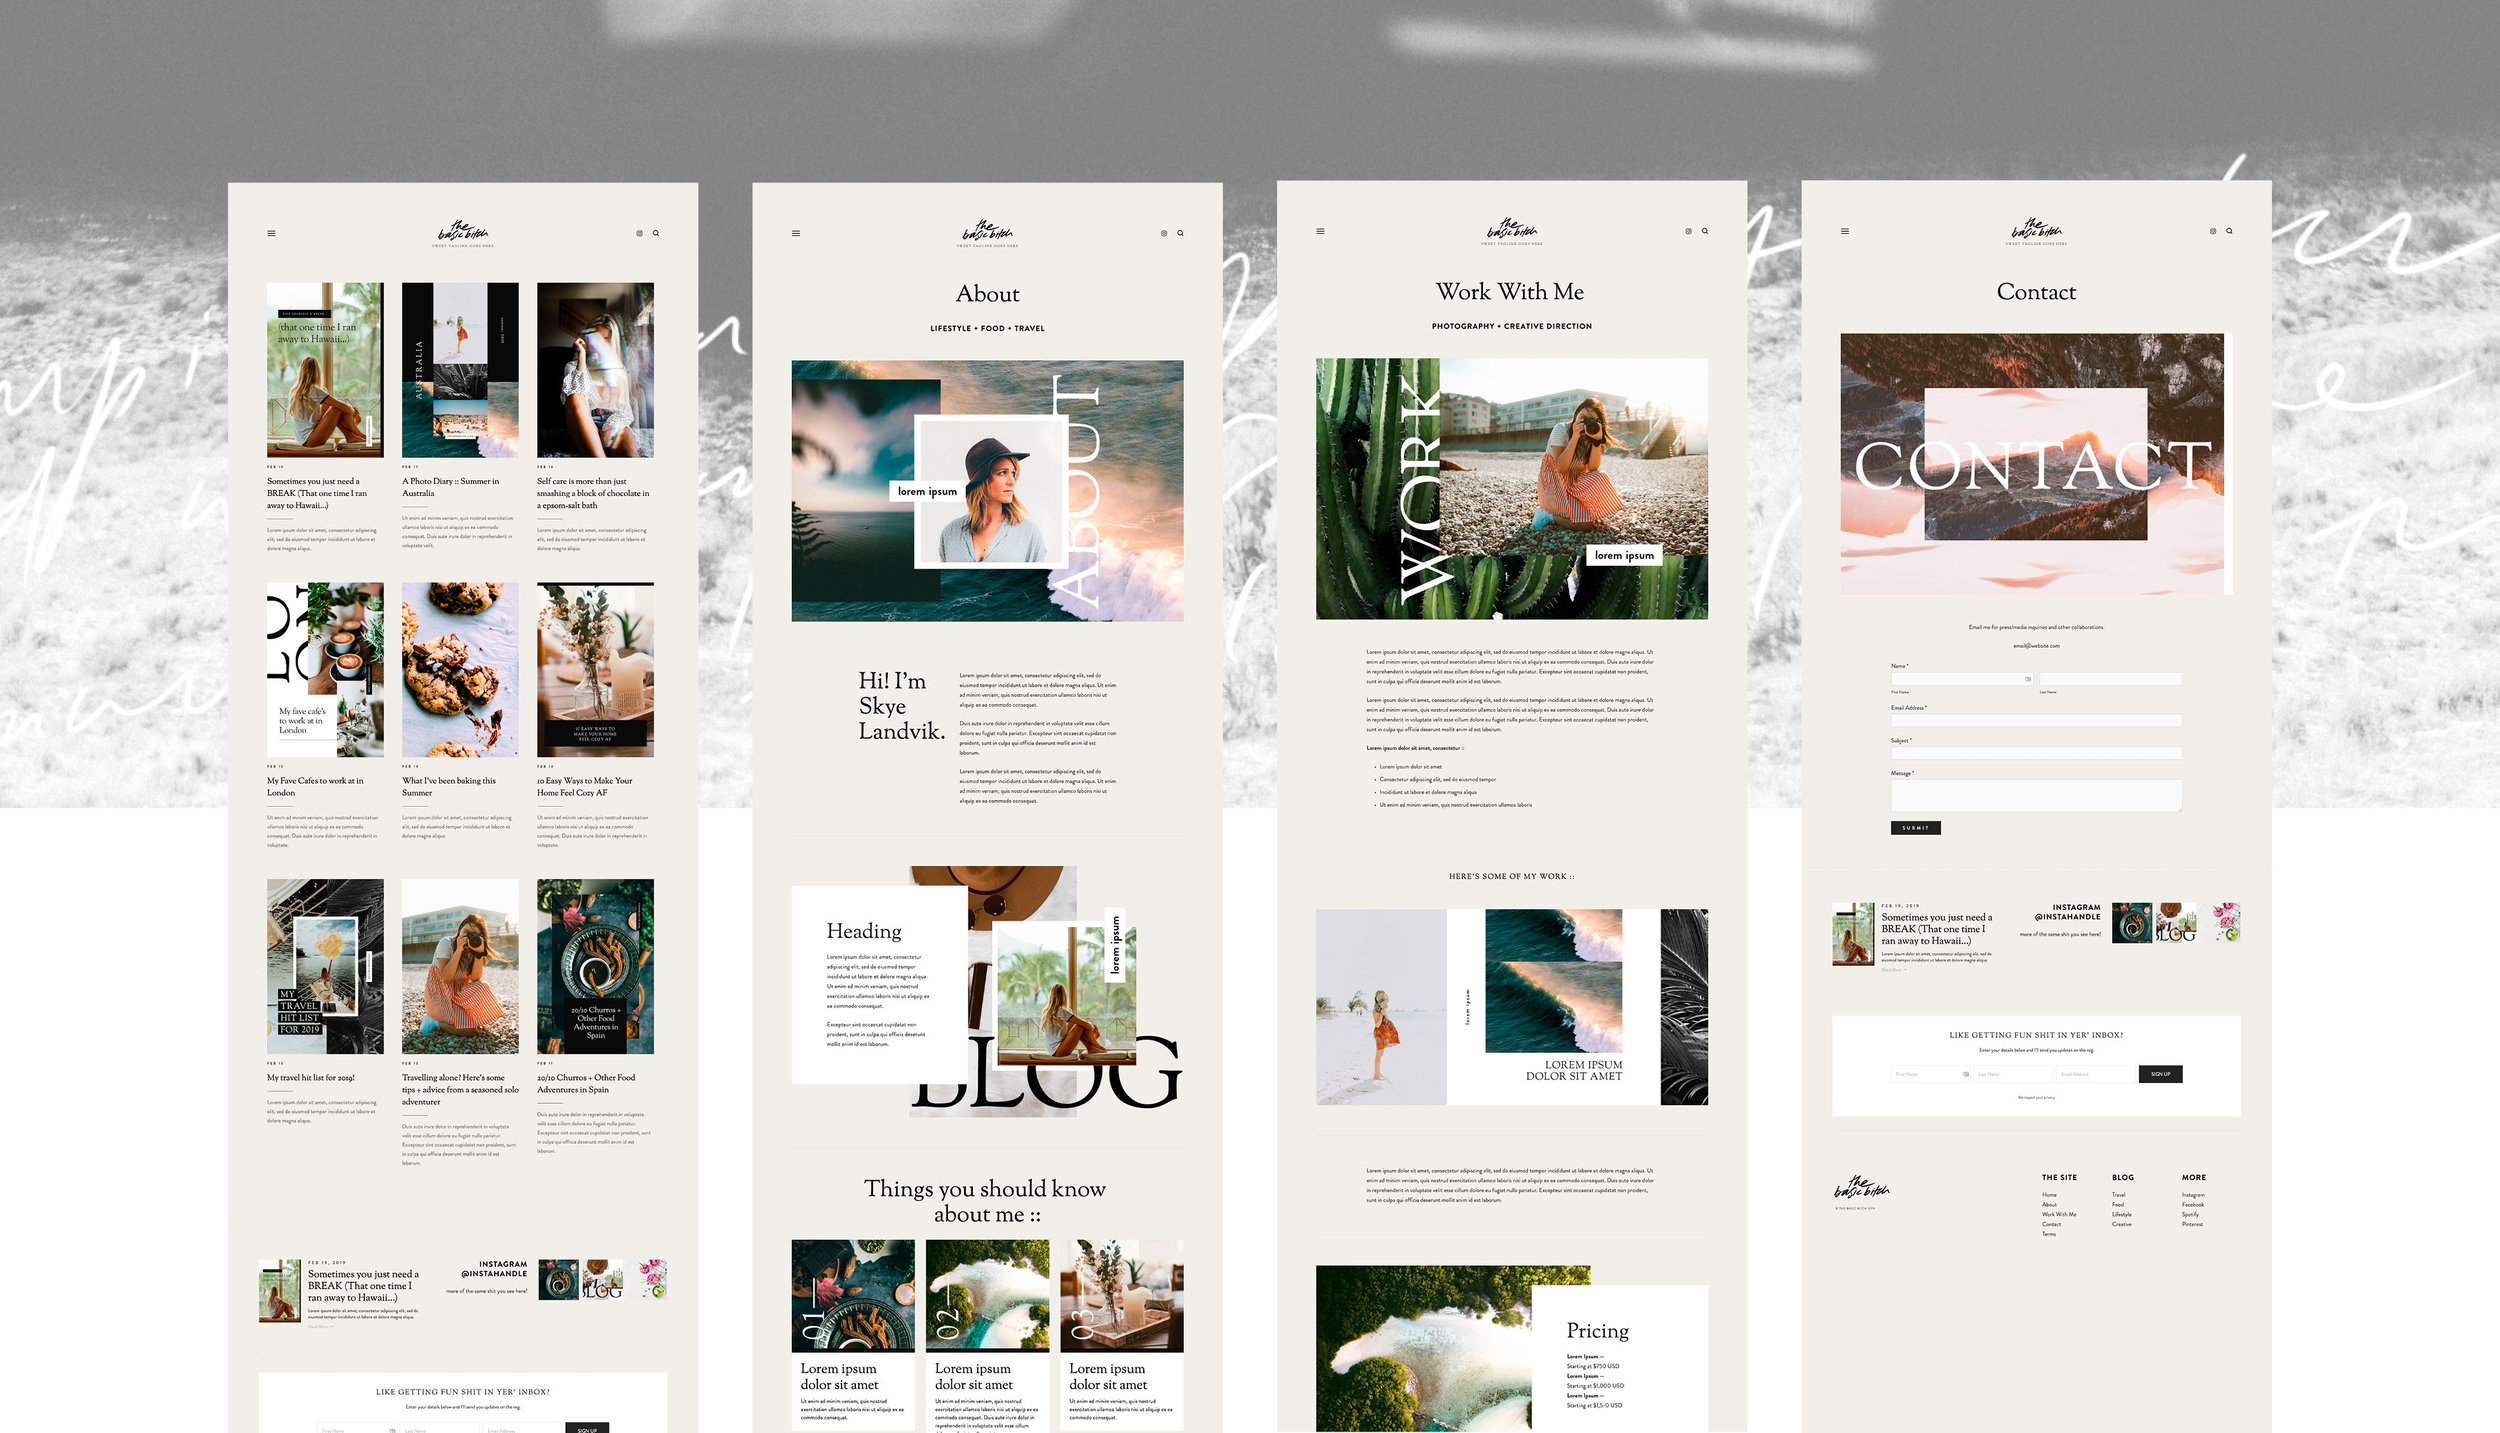 4.jpgThe Basic Bitch – Squarespace Design Kit  Good As Gold Studio   Squarespace Design Kit Templates & DIY Branding